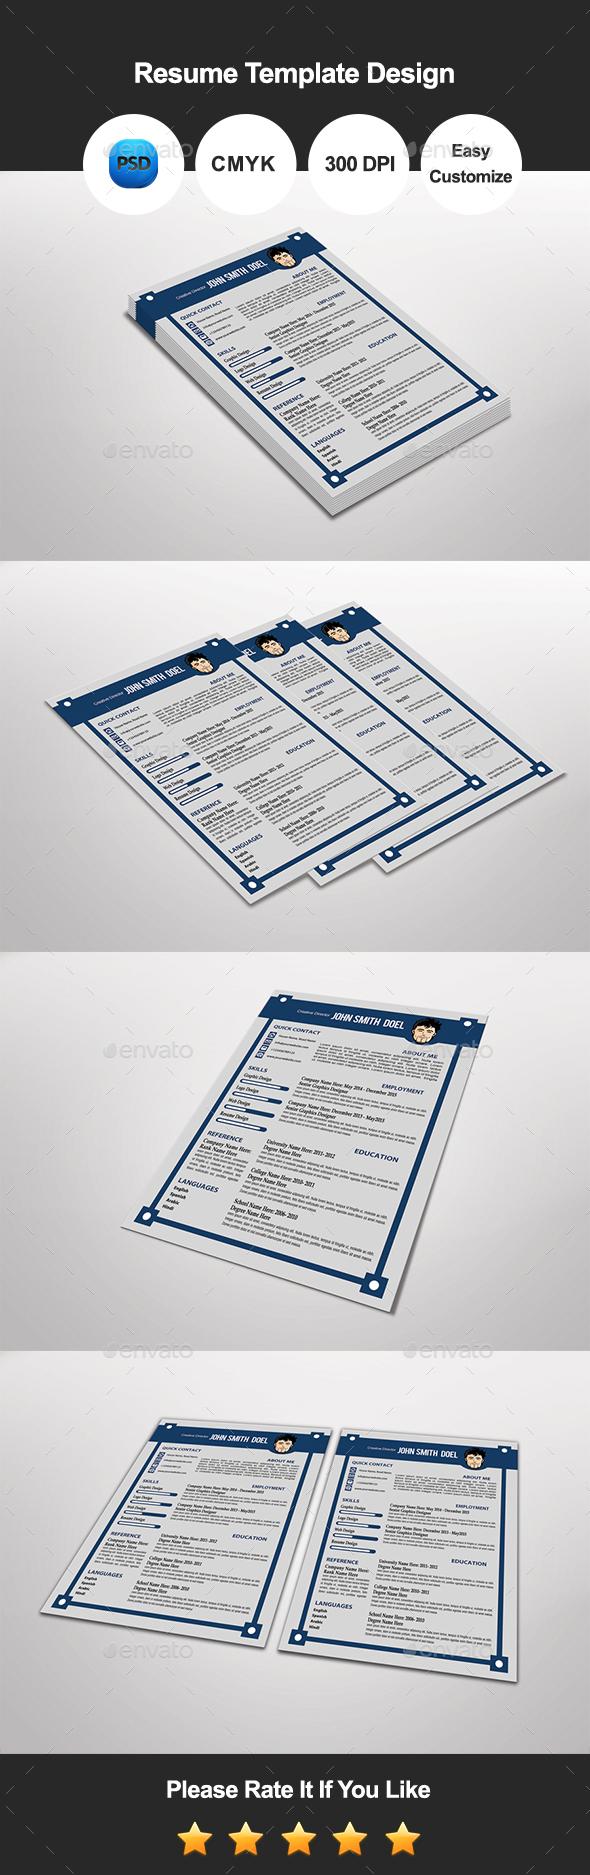 Tanli Resume Template Design